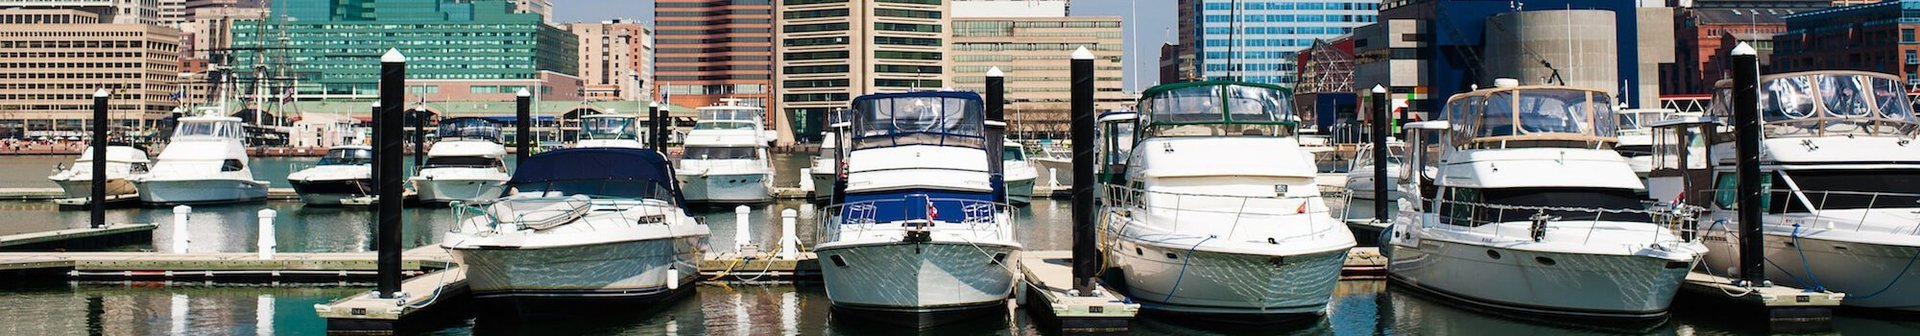 Maryland limo service companies